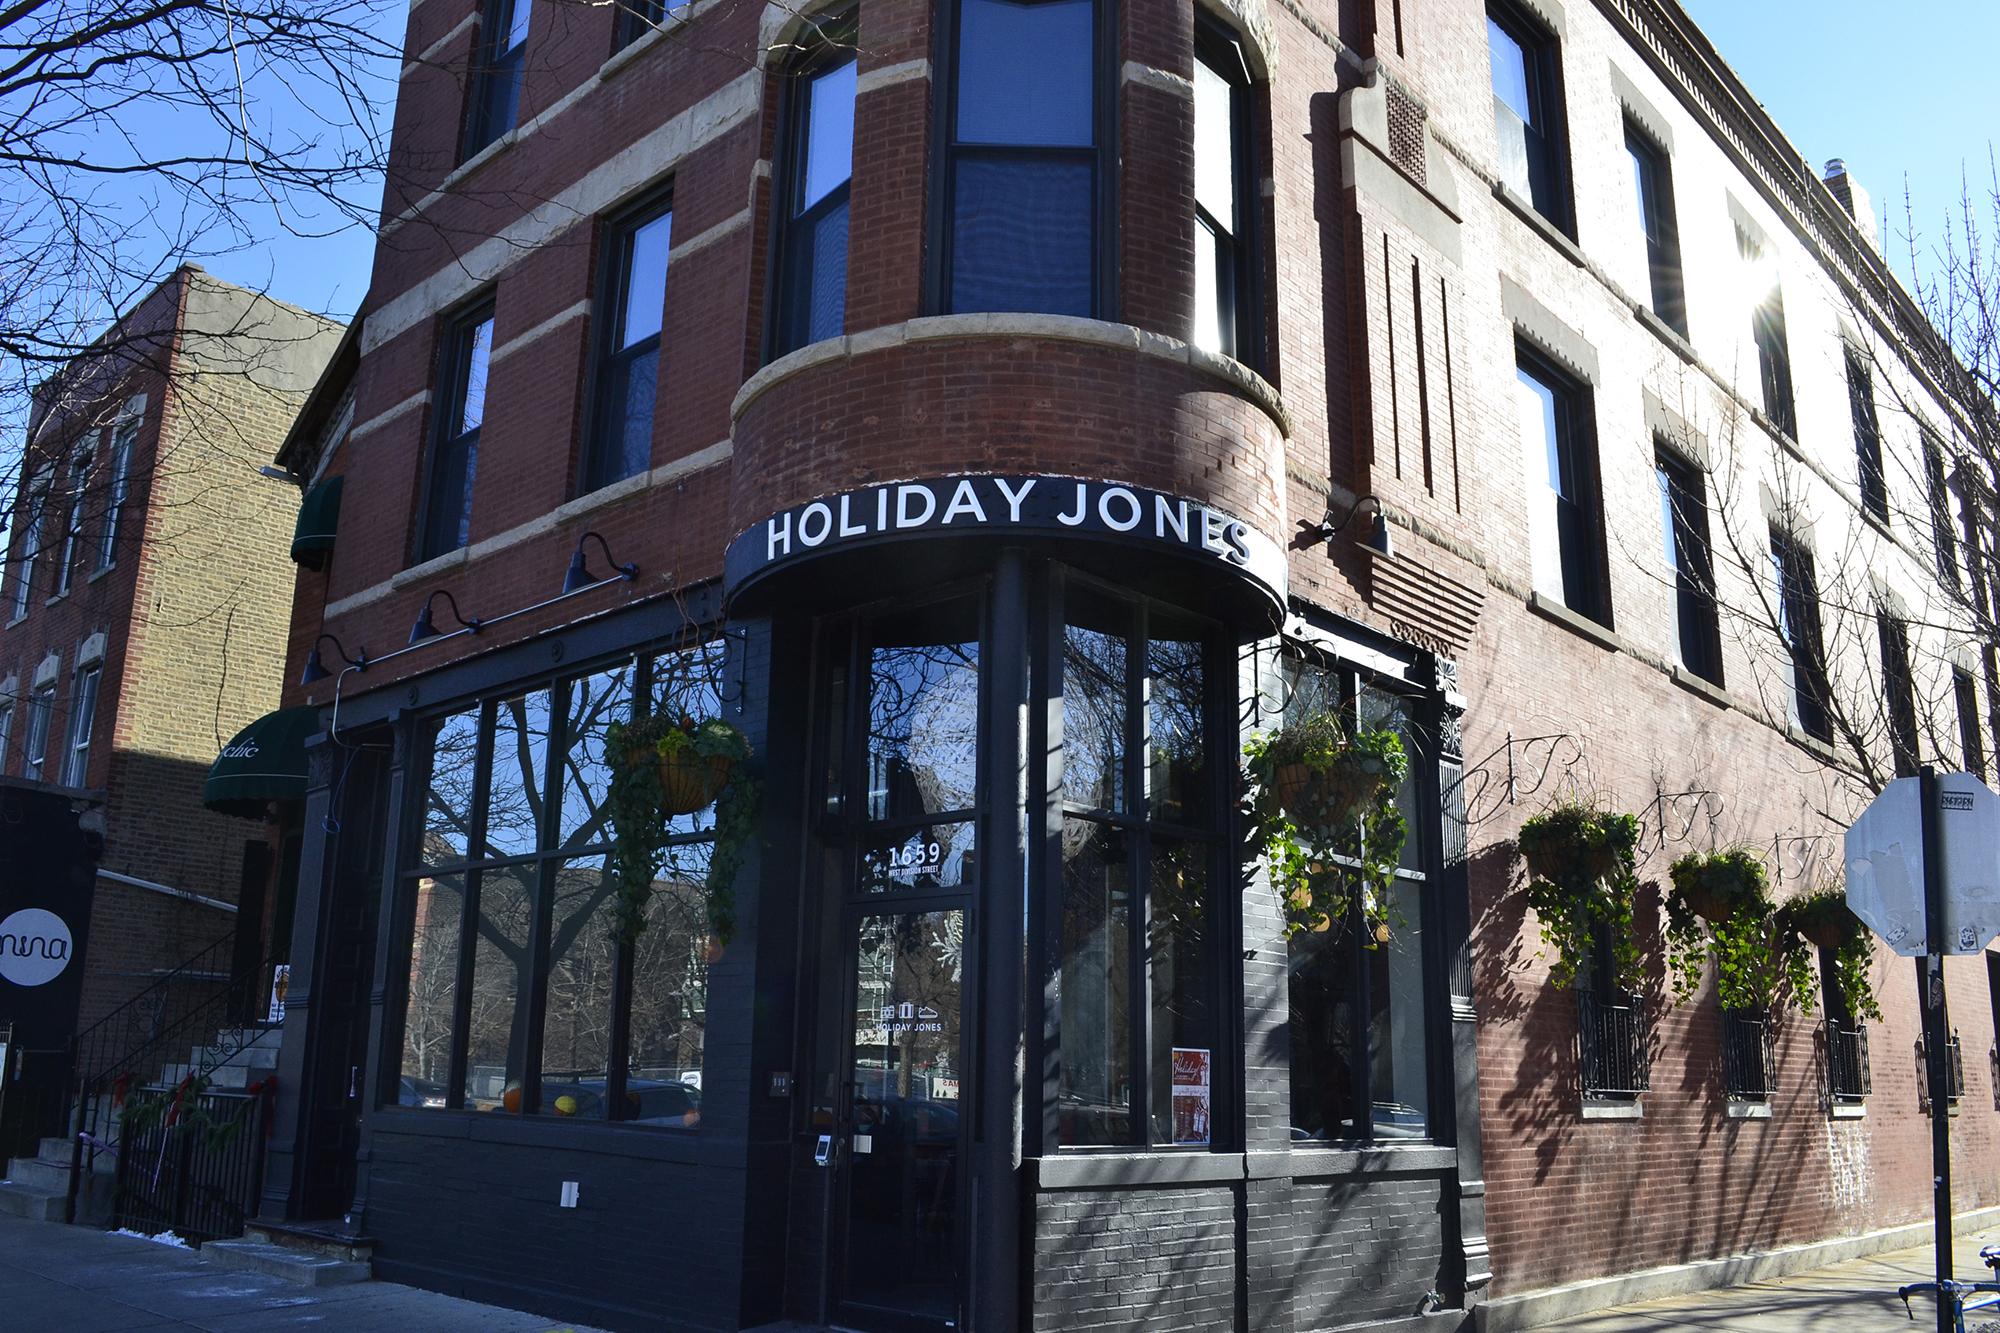 Holiday Jones Chicago